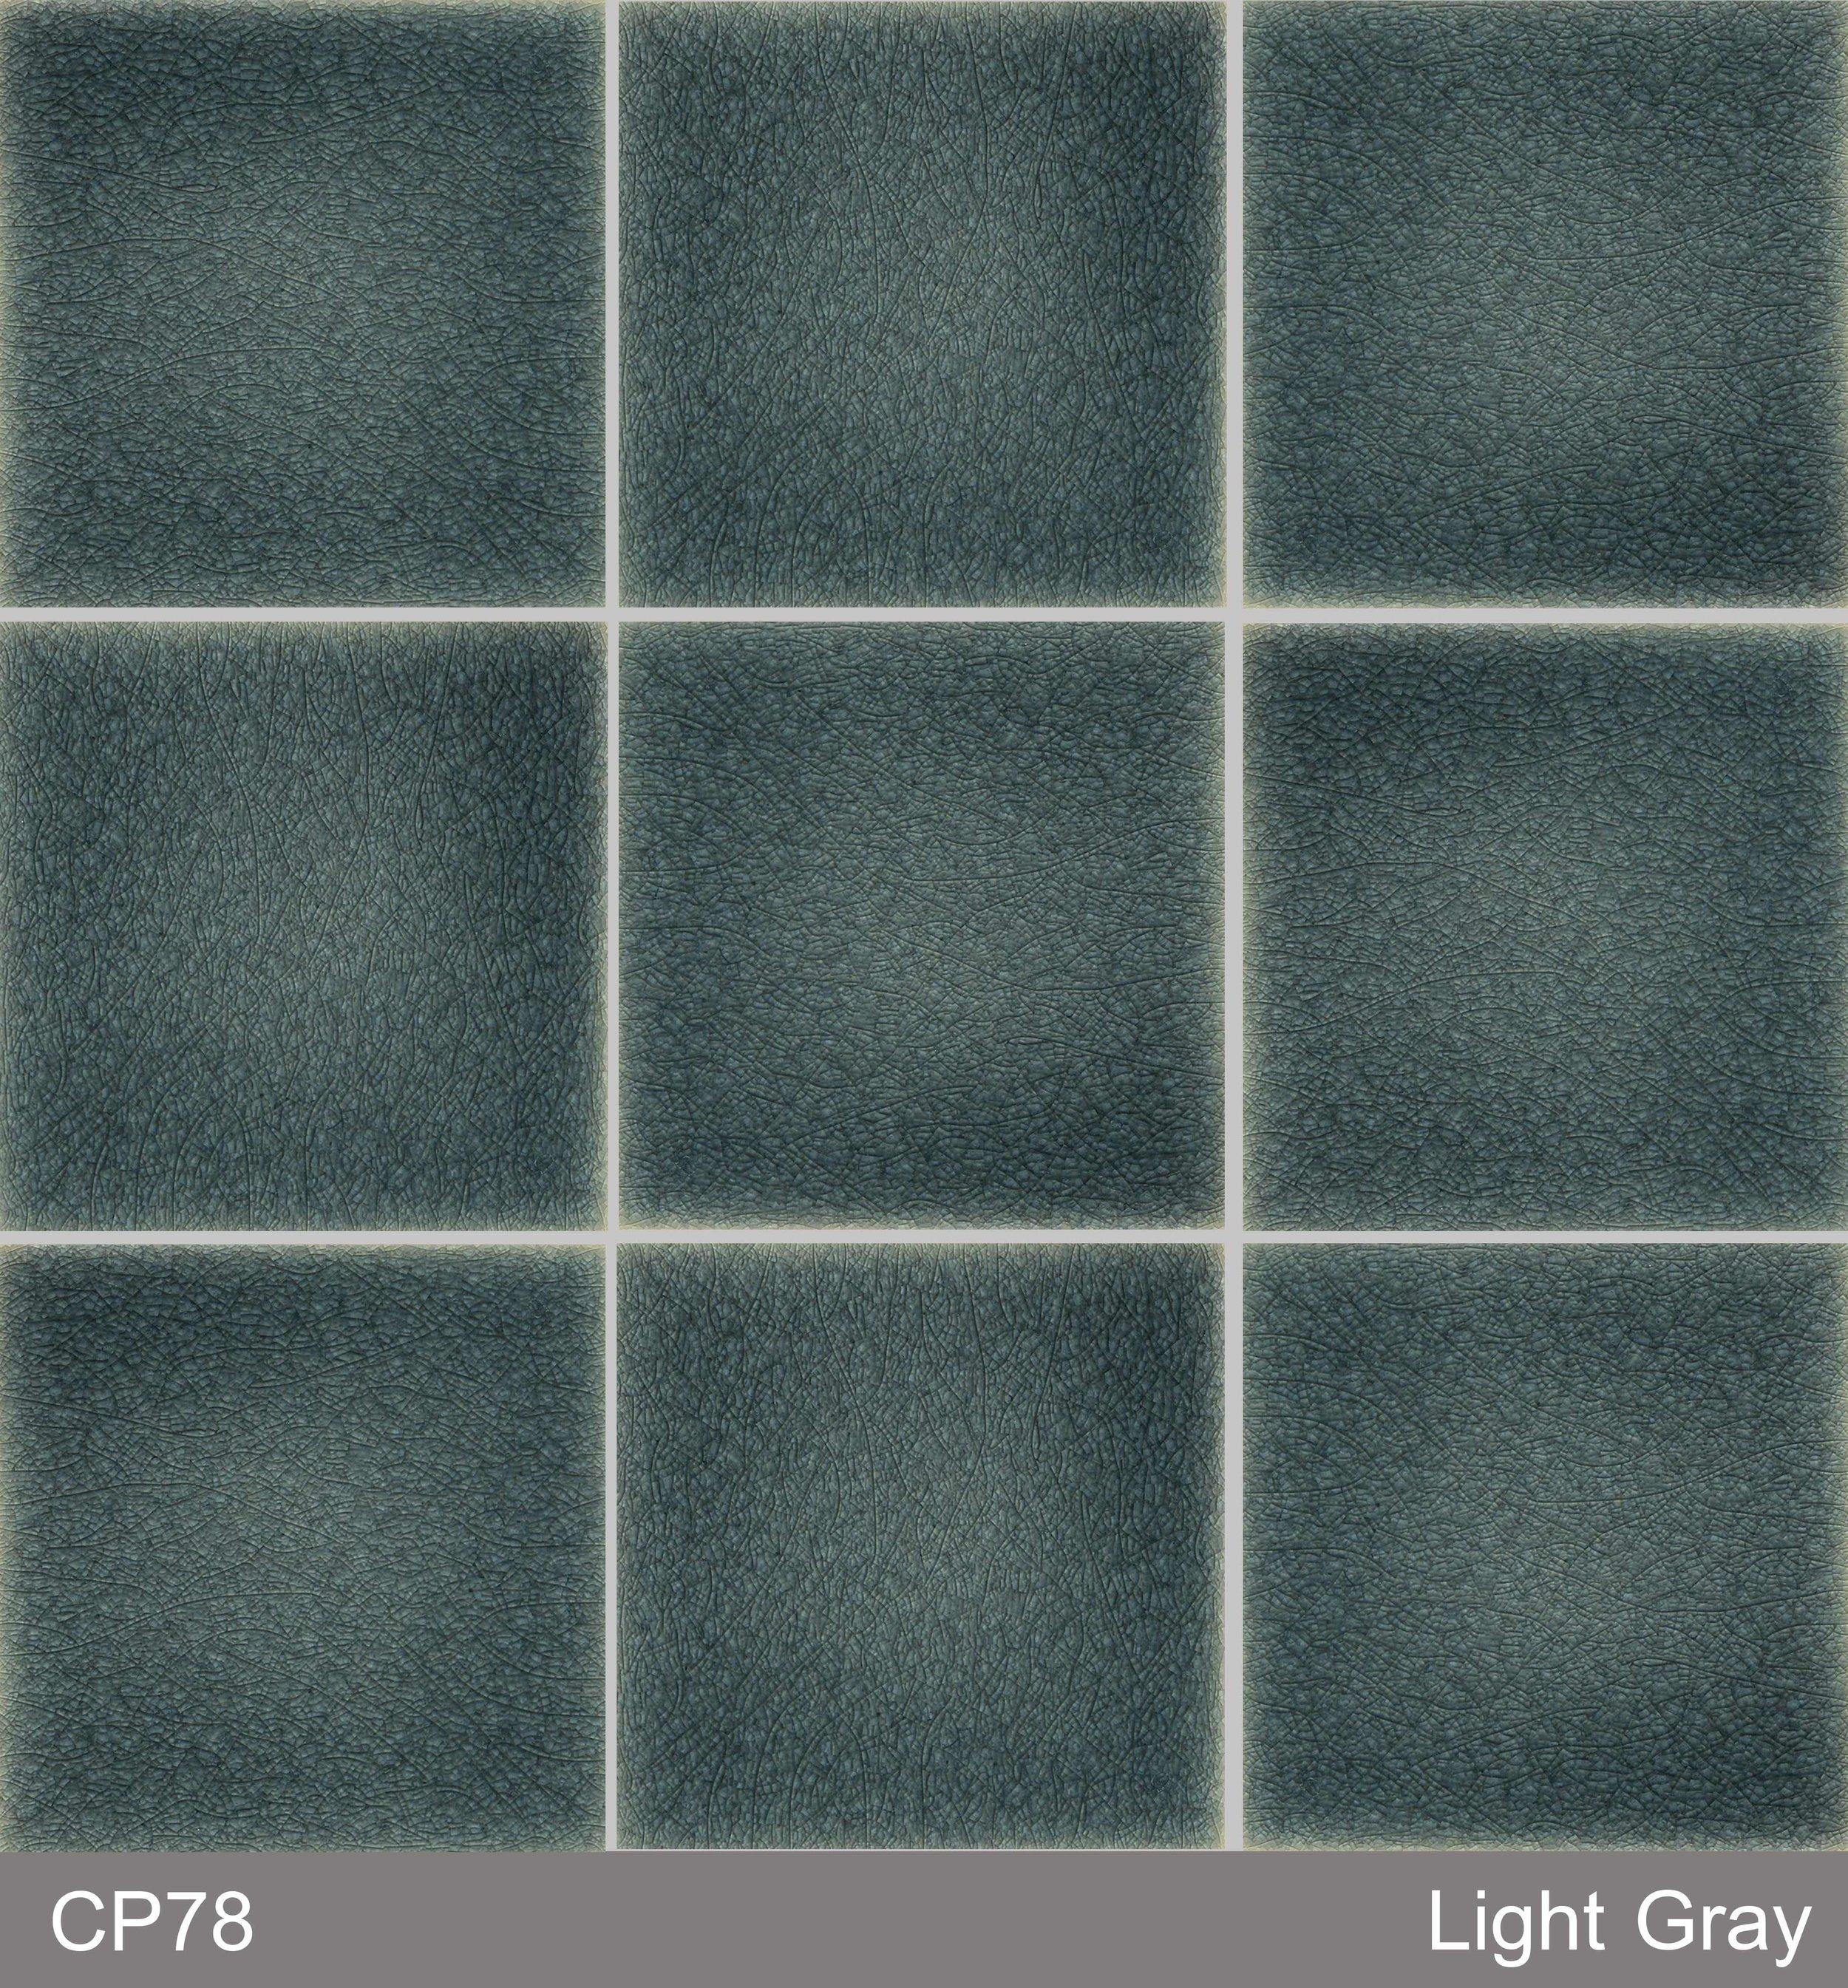 CP78 : Light gray